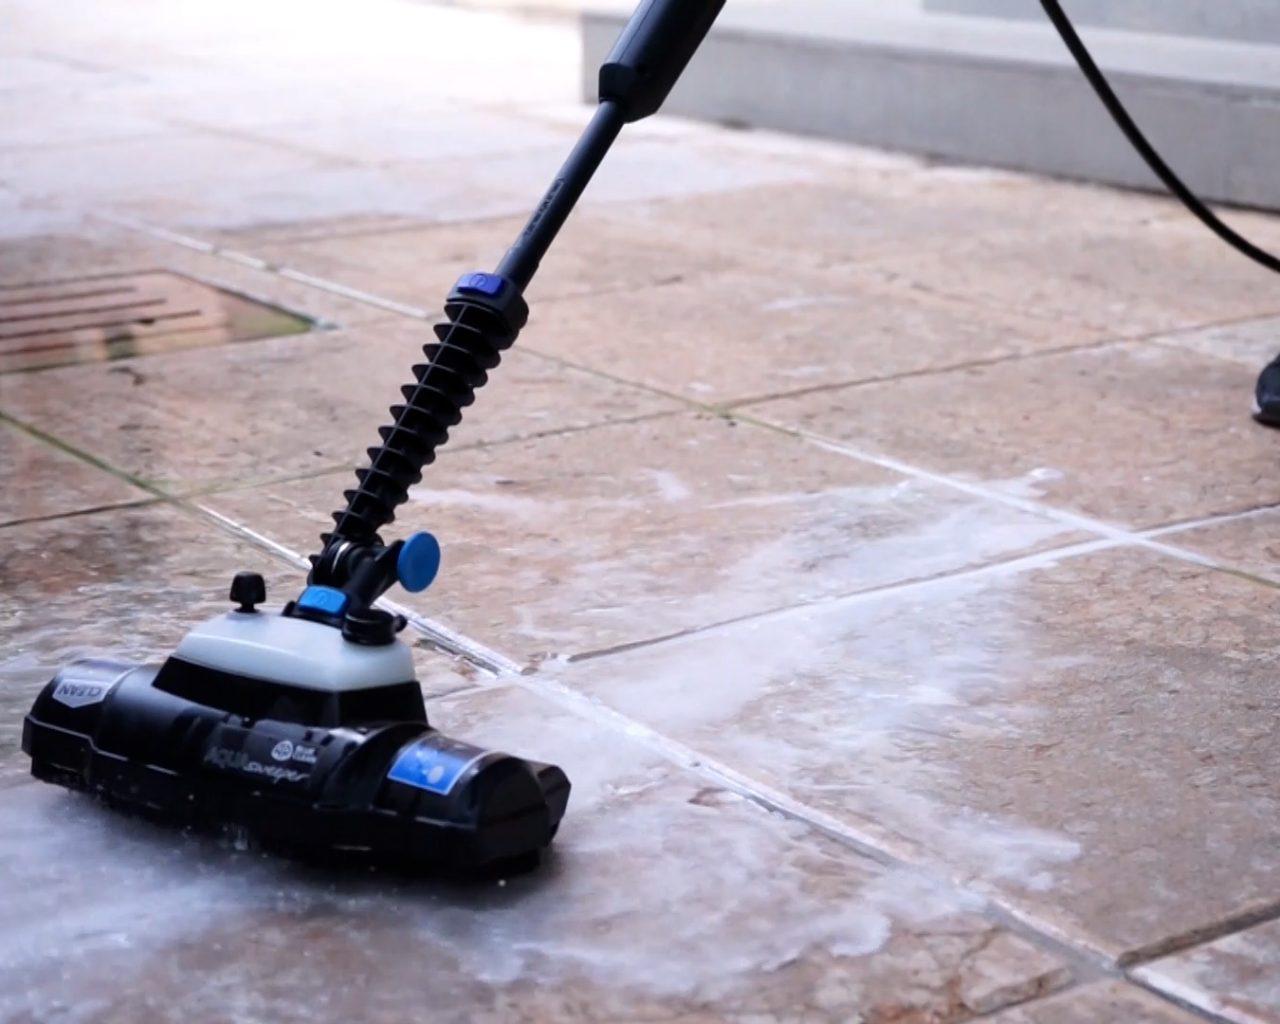 AR Blue Clean Aqua Sweeper Lavapavimenti per Idropulitrice